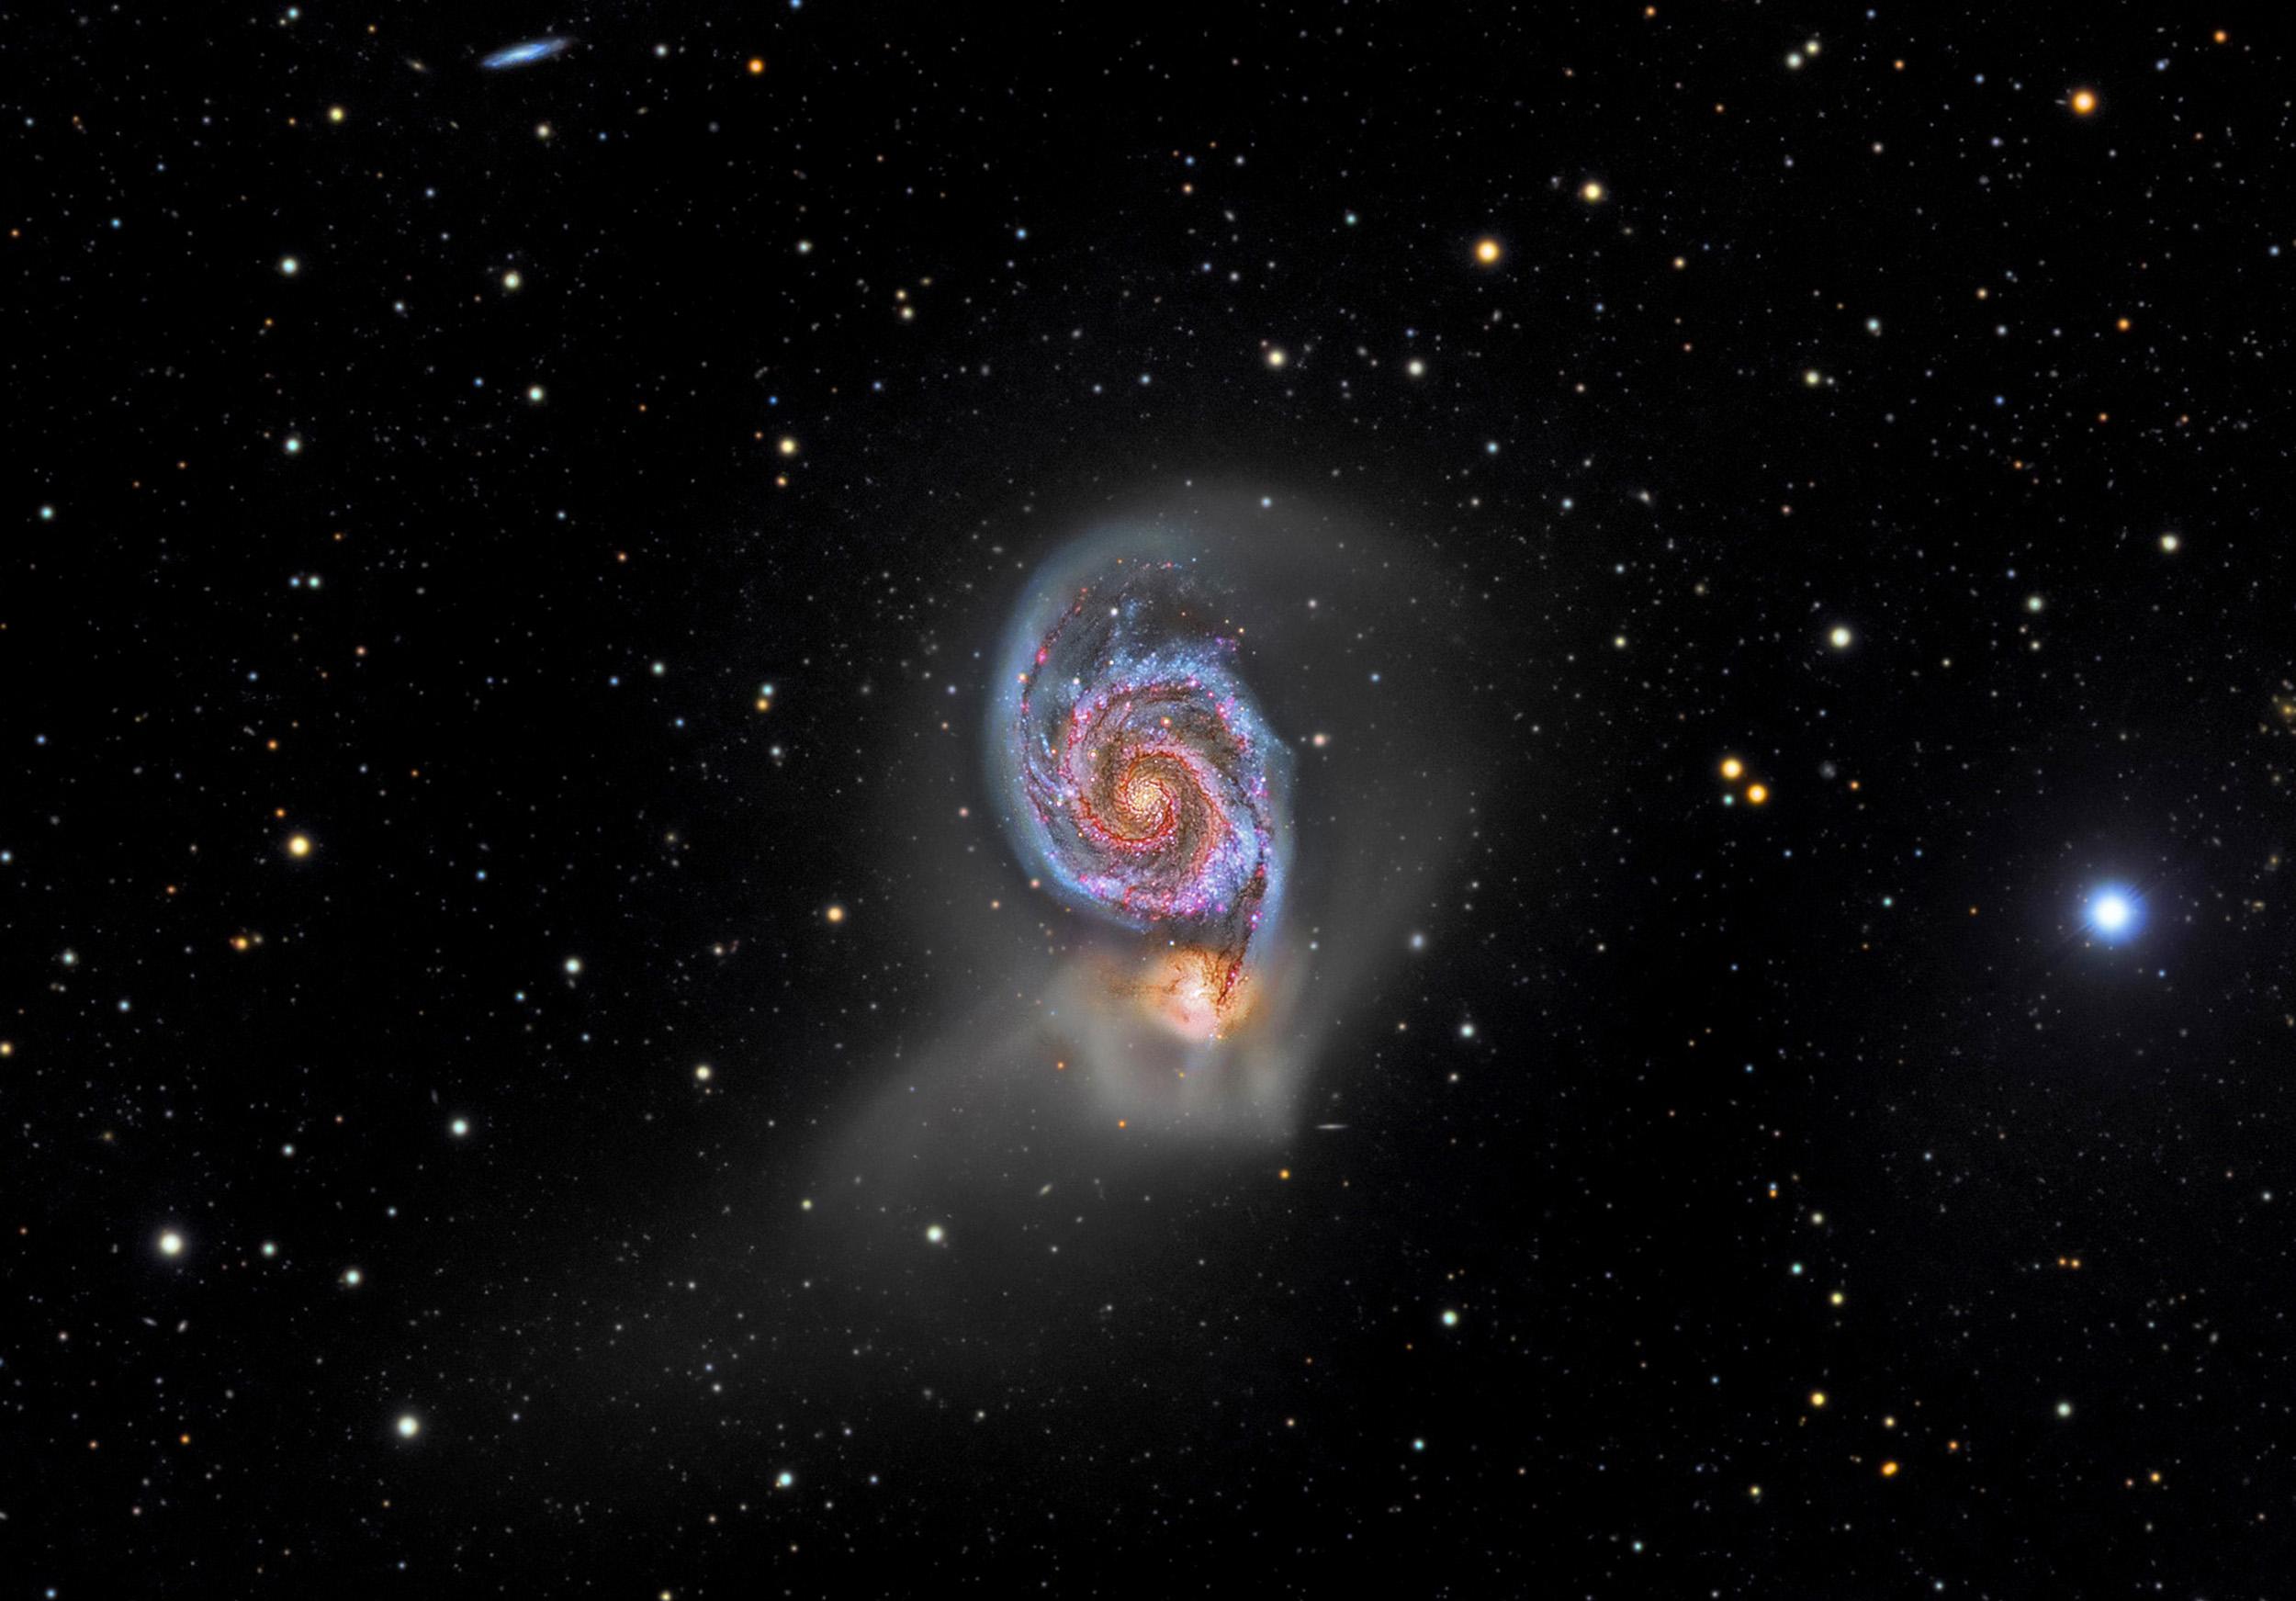 The Whirlpool Galaxy (M51) in Canes Venatici